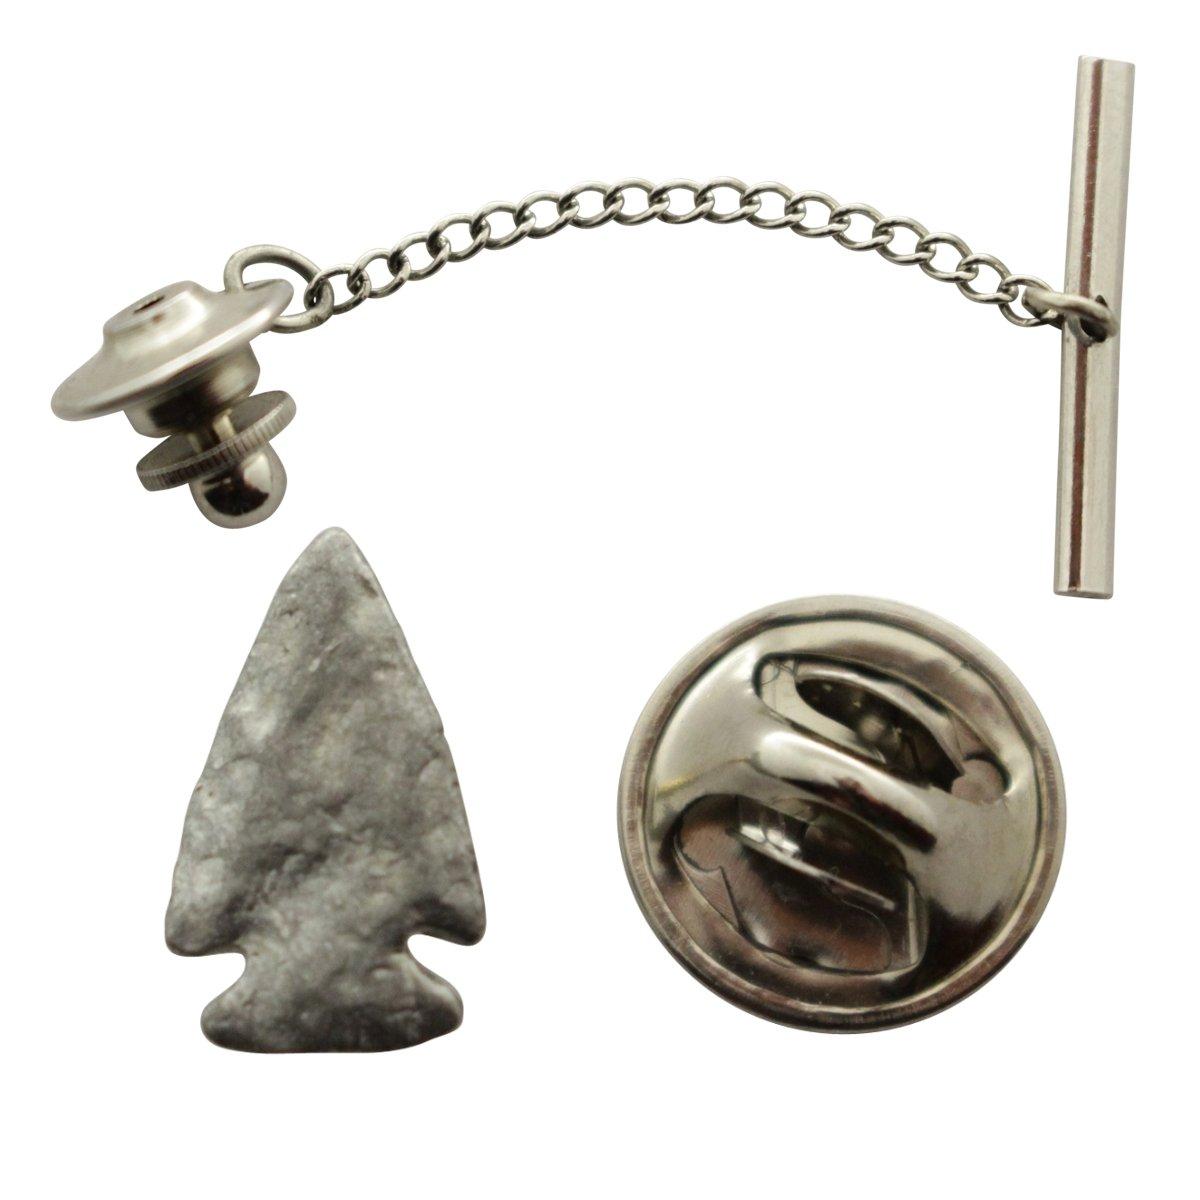 Arrowhead Tie Tack ~ Antiqued Pewter ~ Tie Tack or Pin ~ Sarah's Treats & Treasures